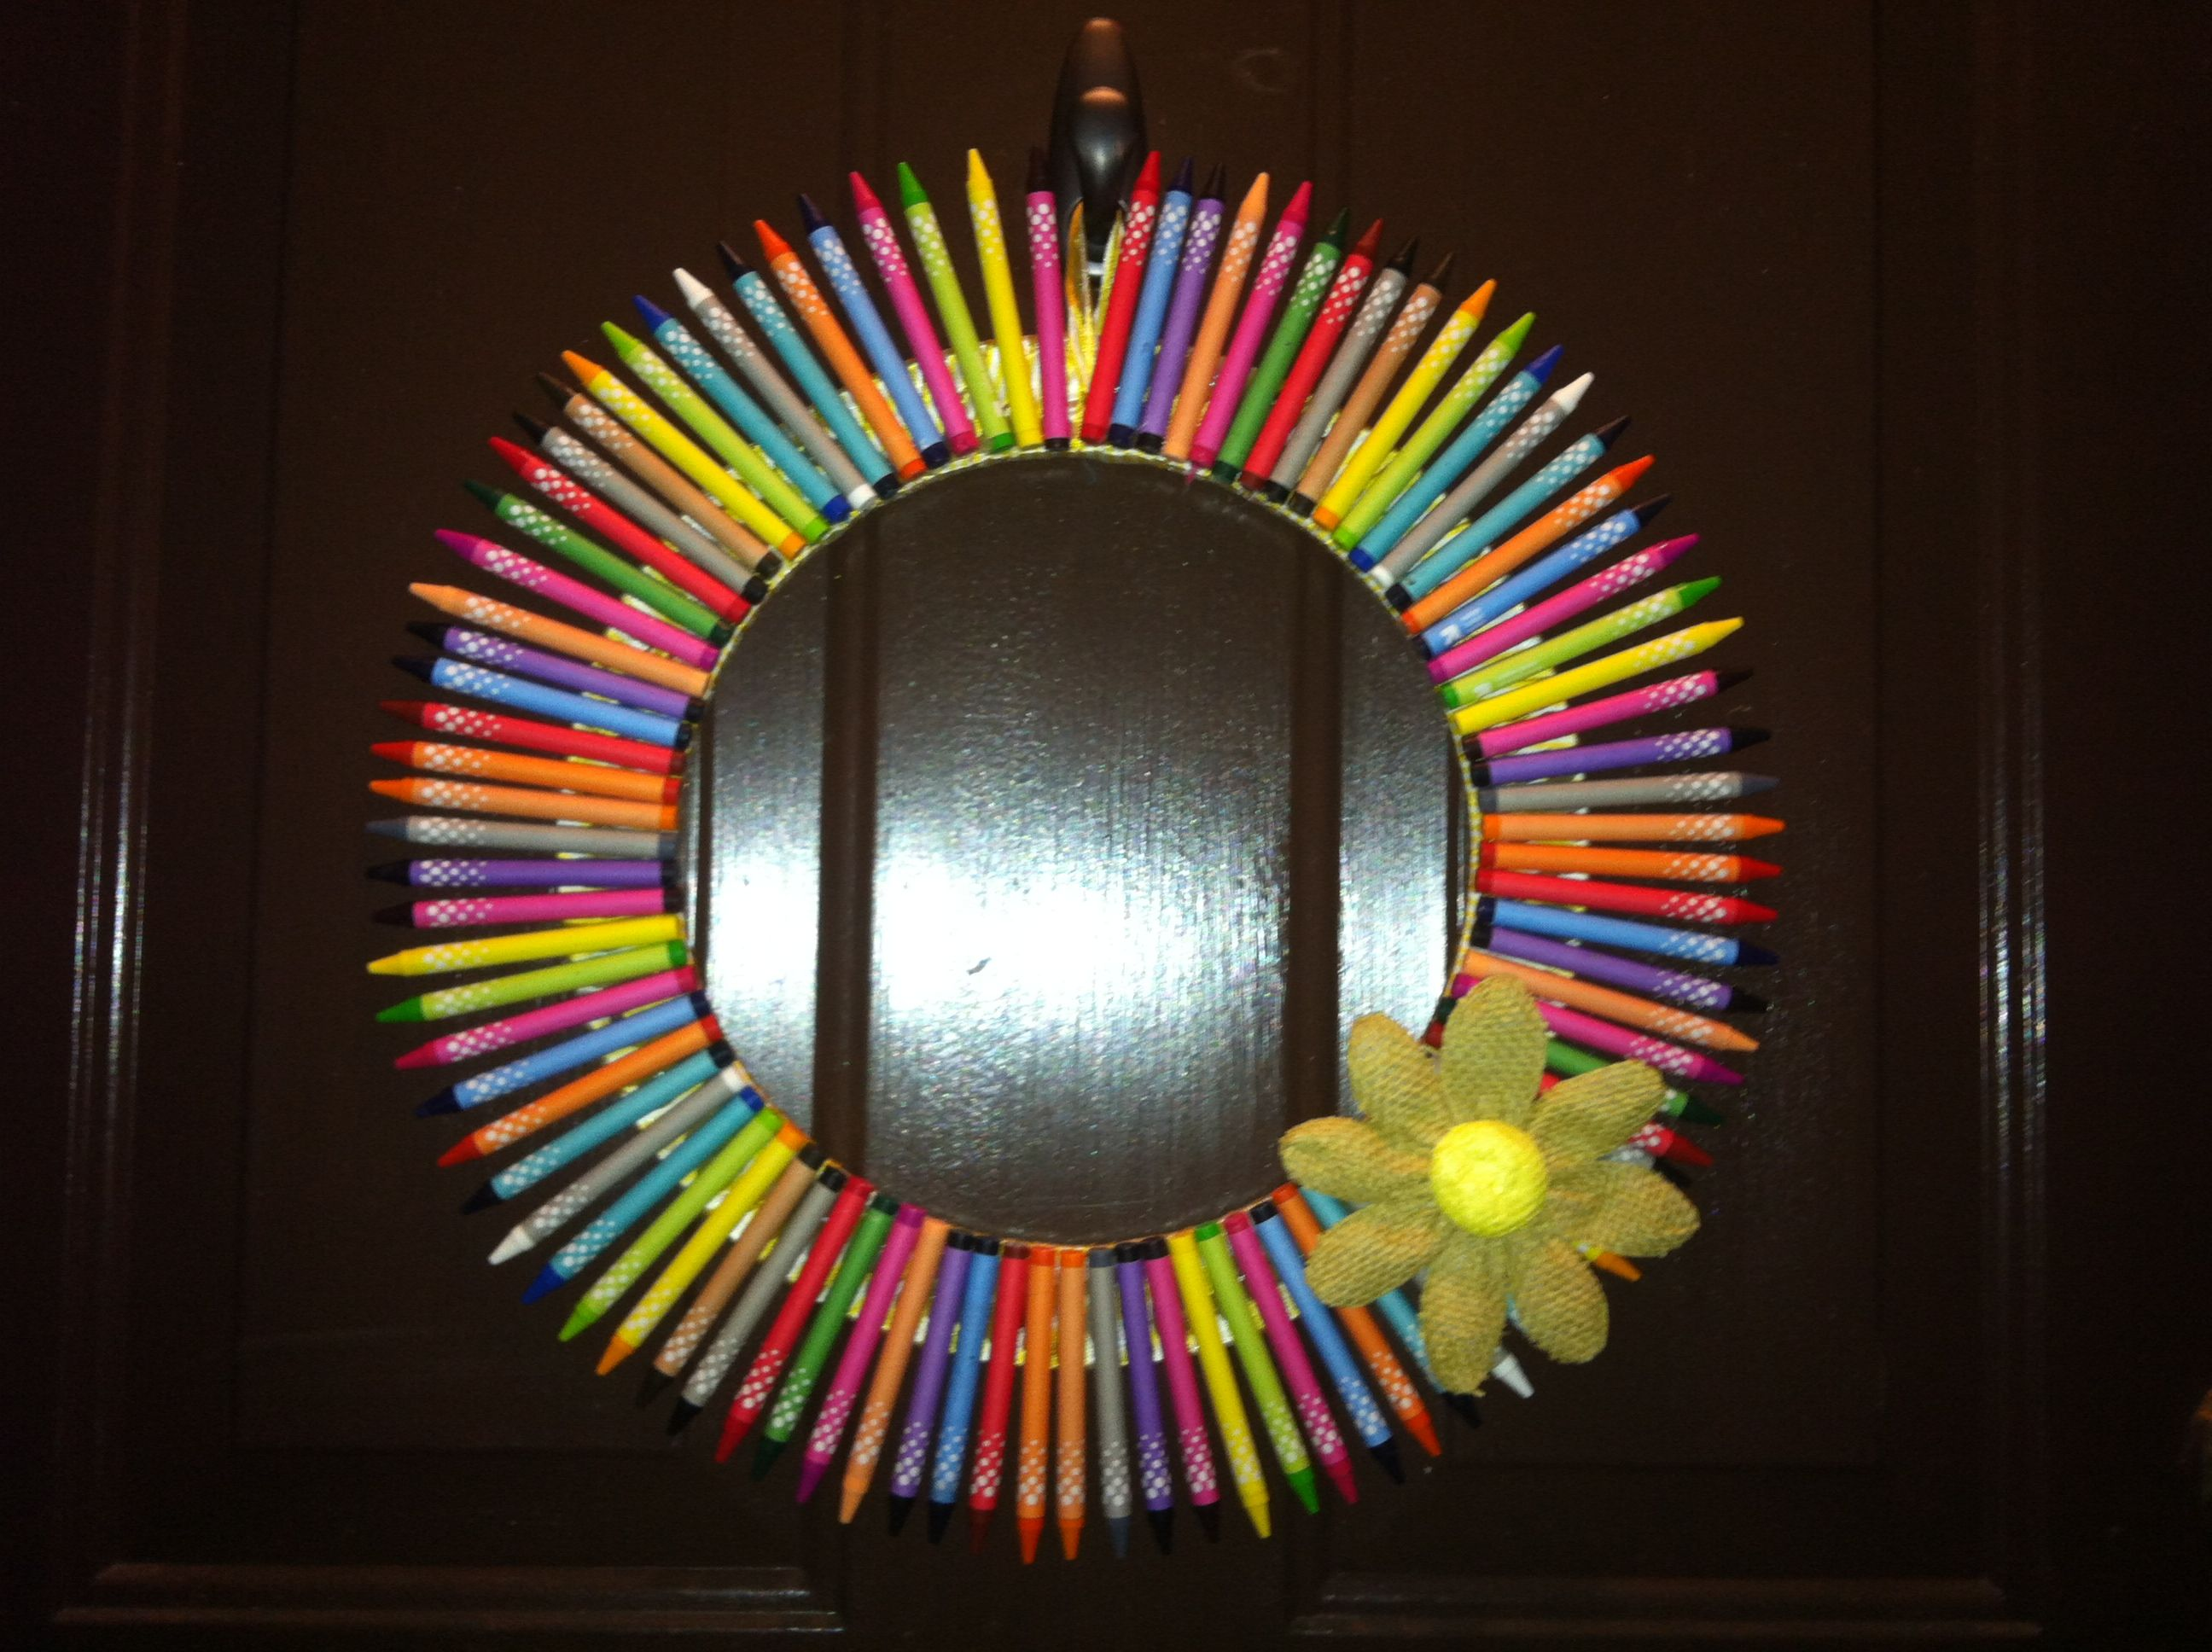 Crayon wreath for back to school decor school